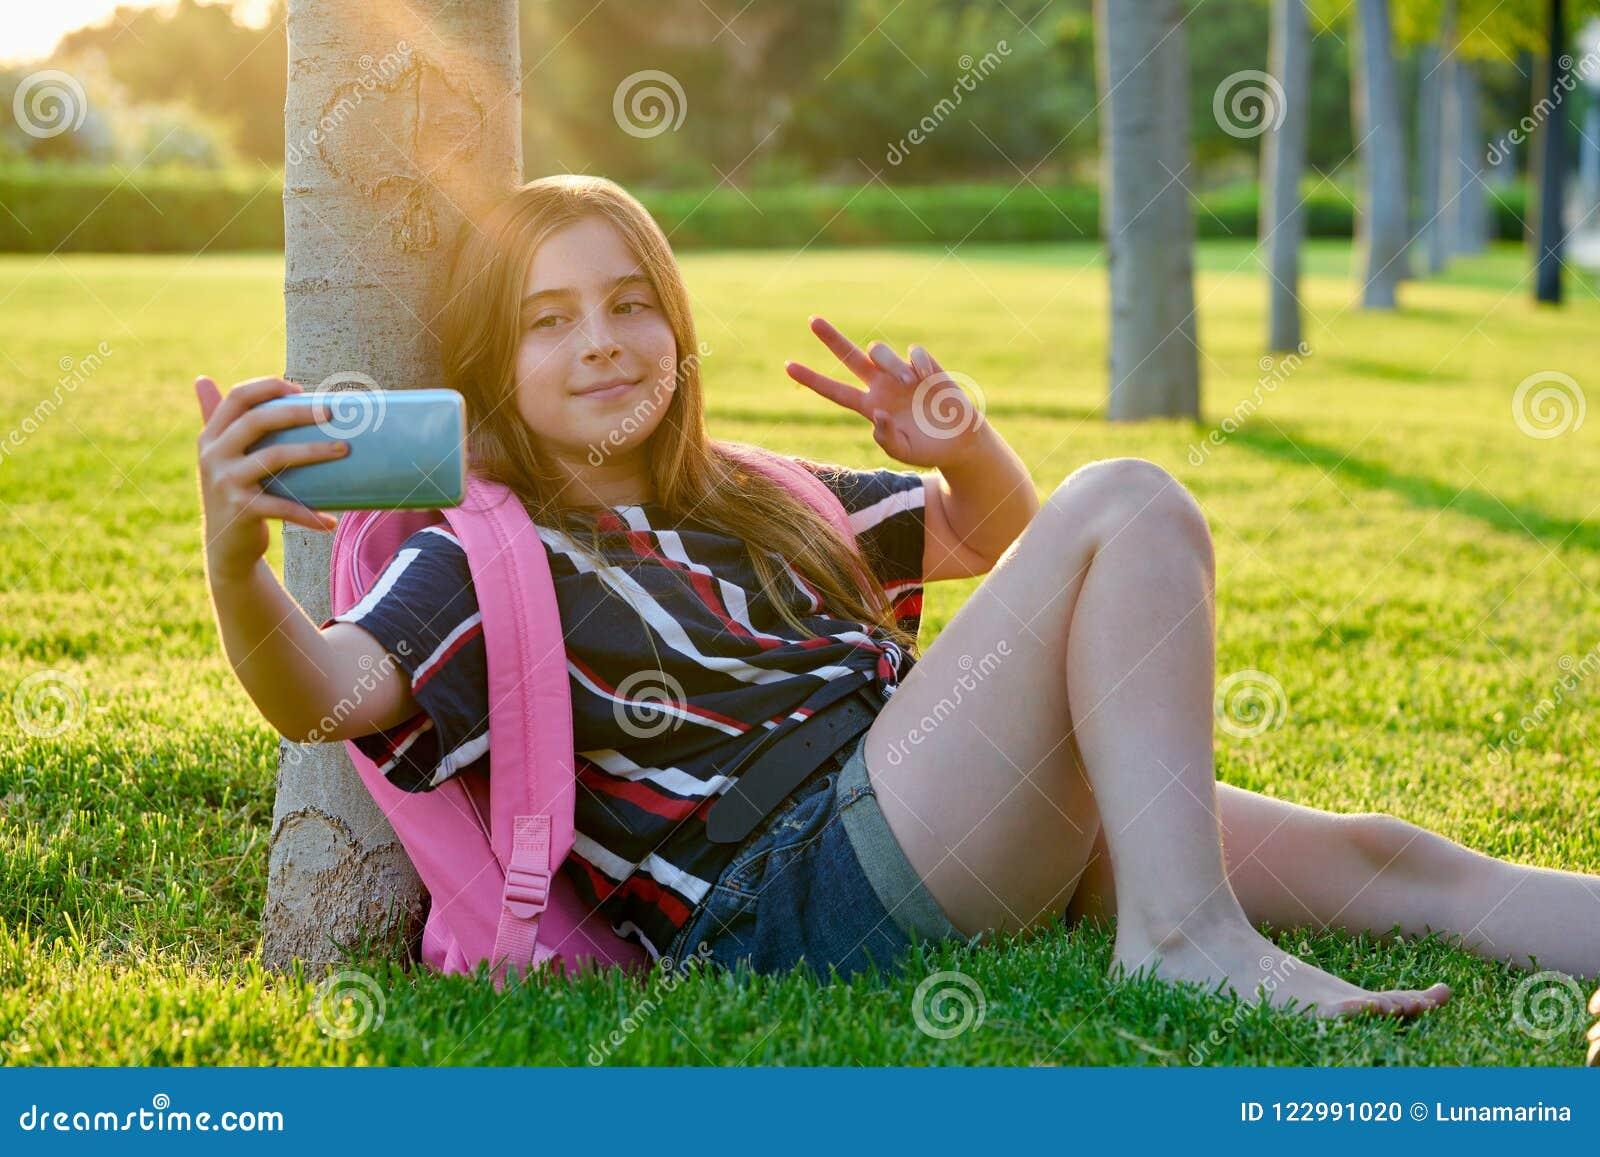 https://thumbs.dreamstime.com/z/blond-student-kid-girl-smartphone-park-back-to-school-sit-grass-122991020.jpg